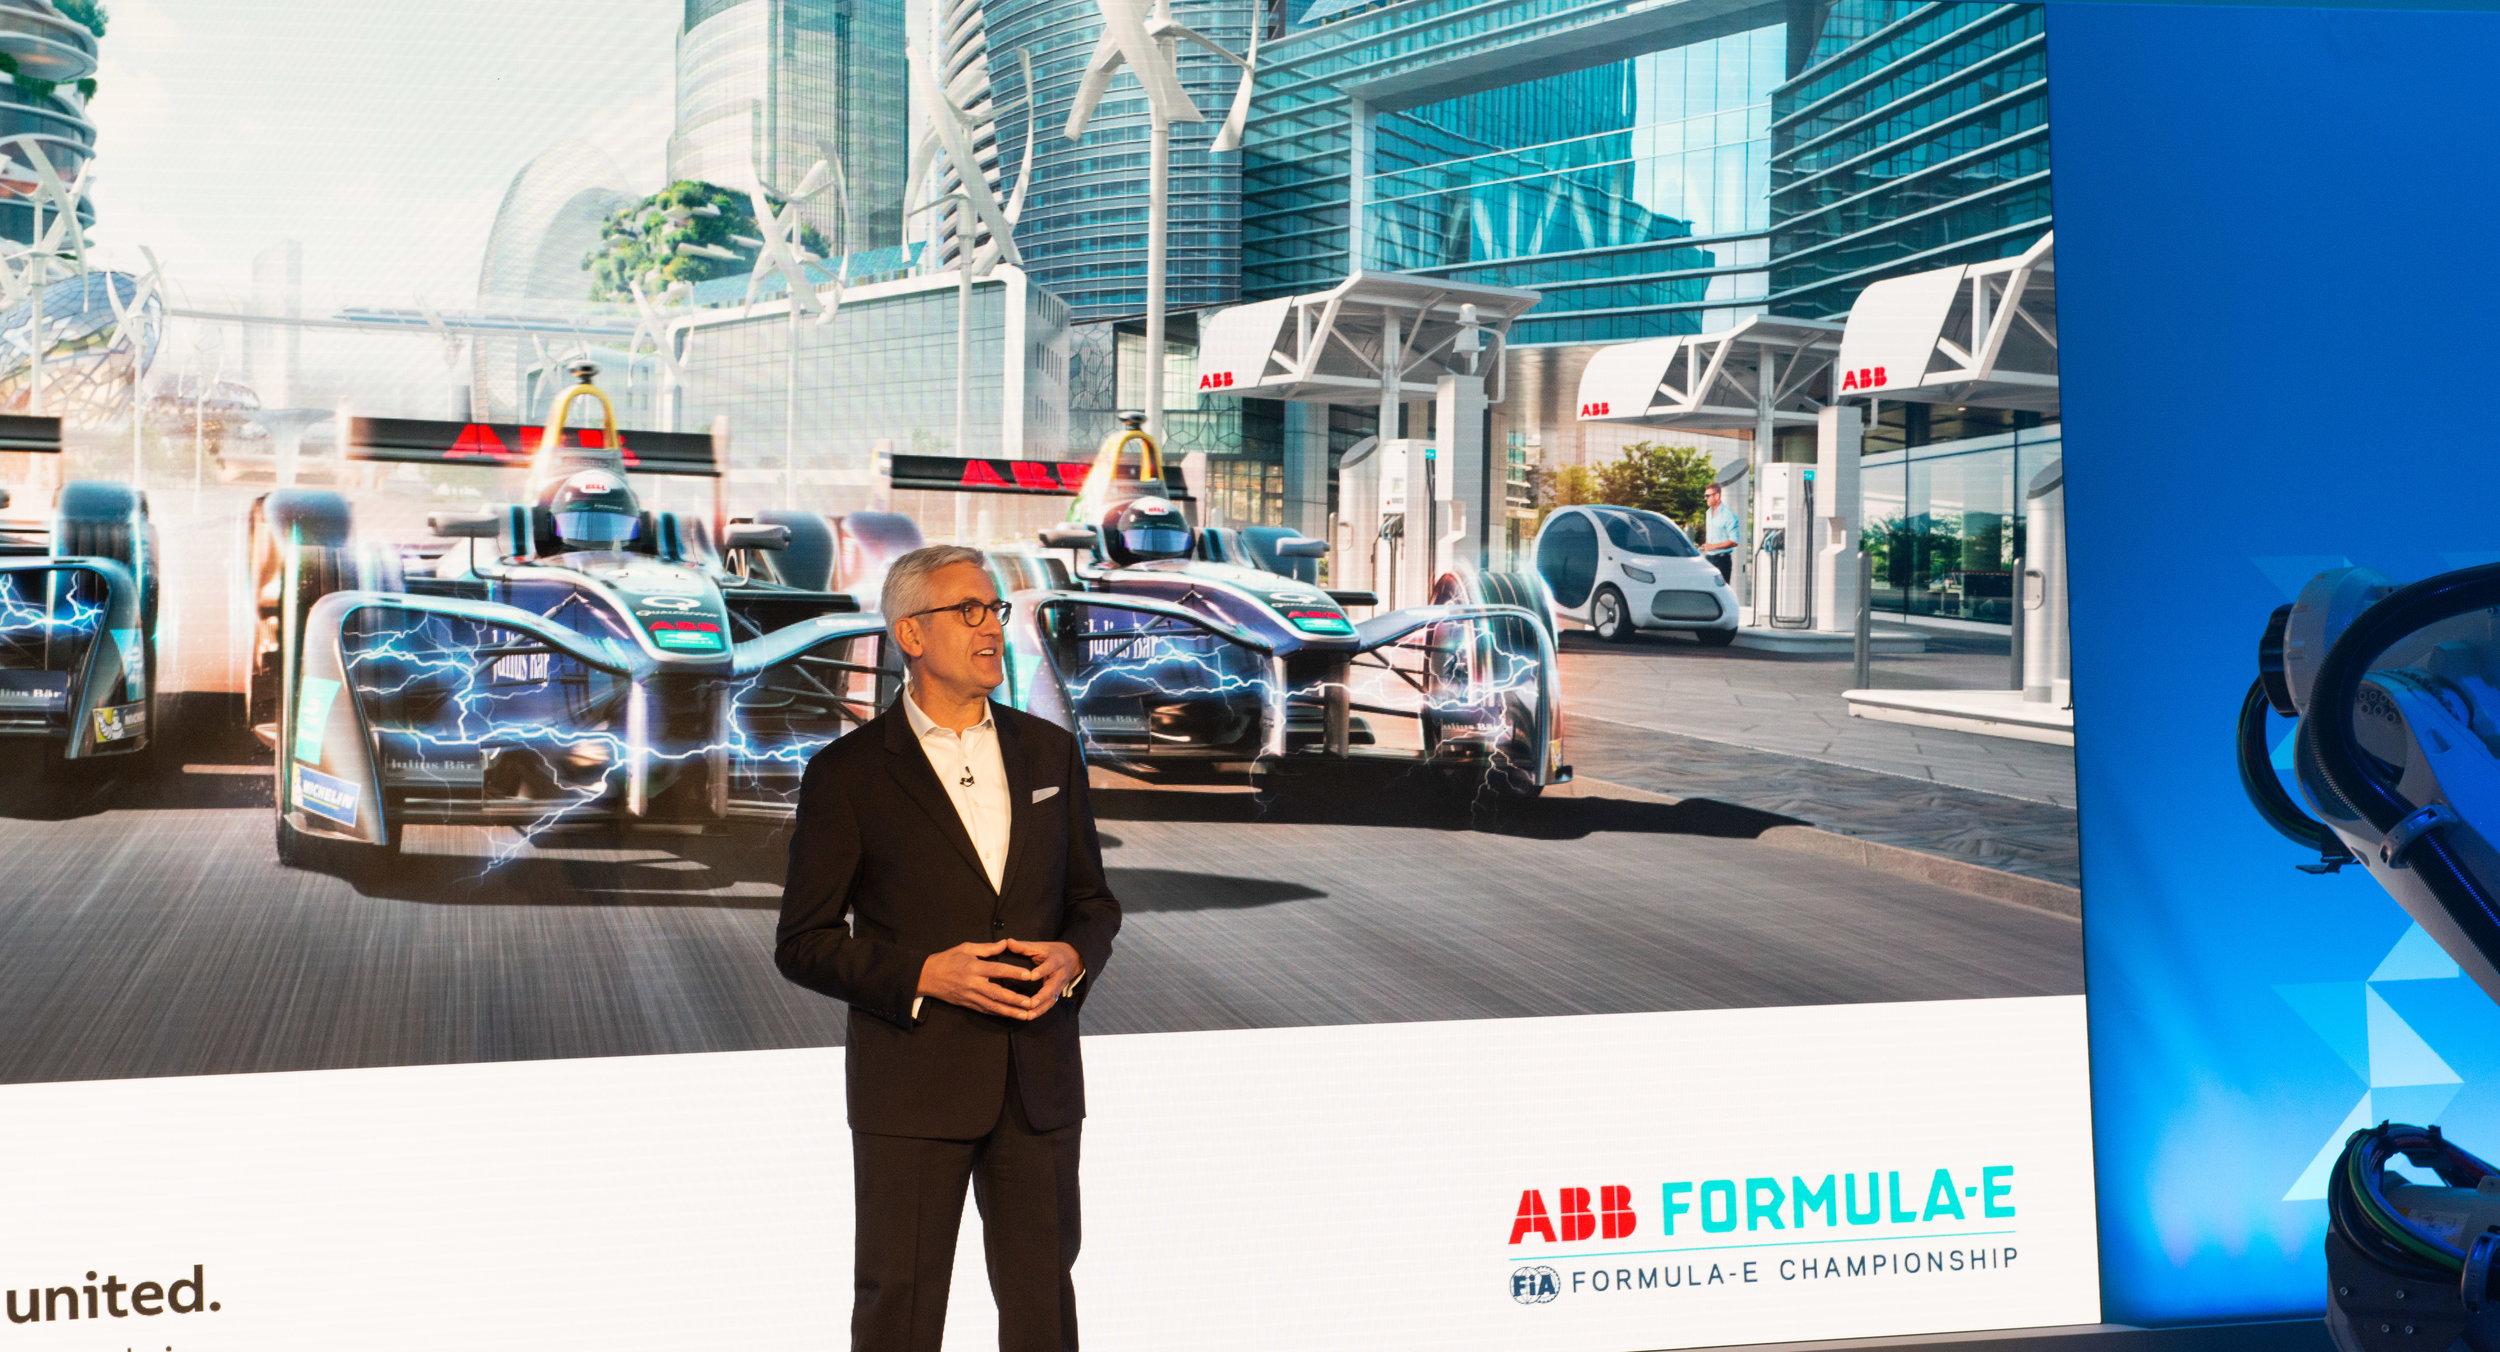 Ulrich Spiesshofer, Head Of ABB